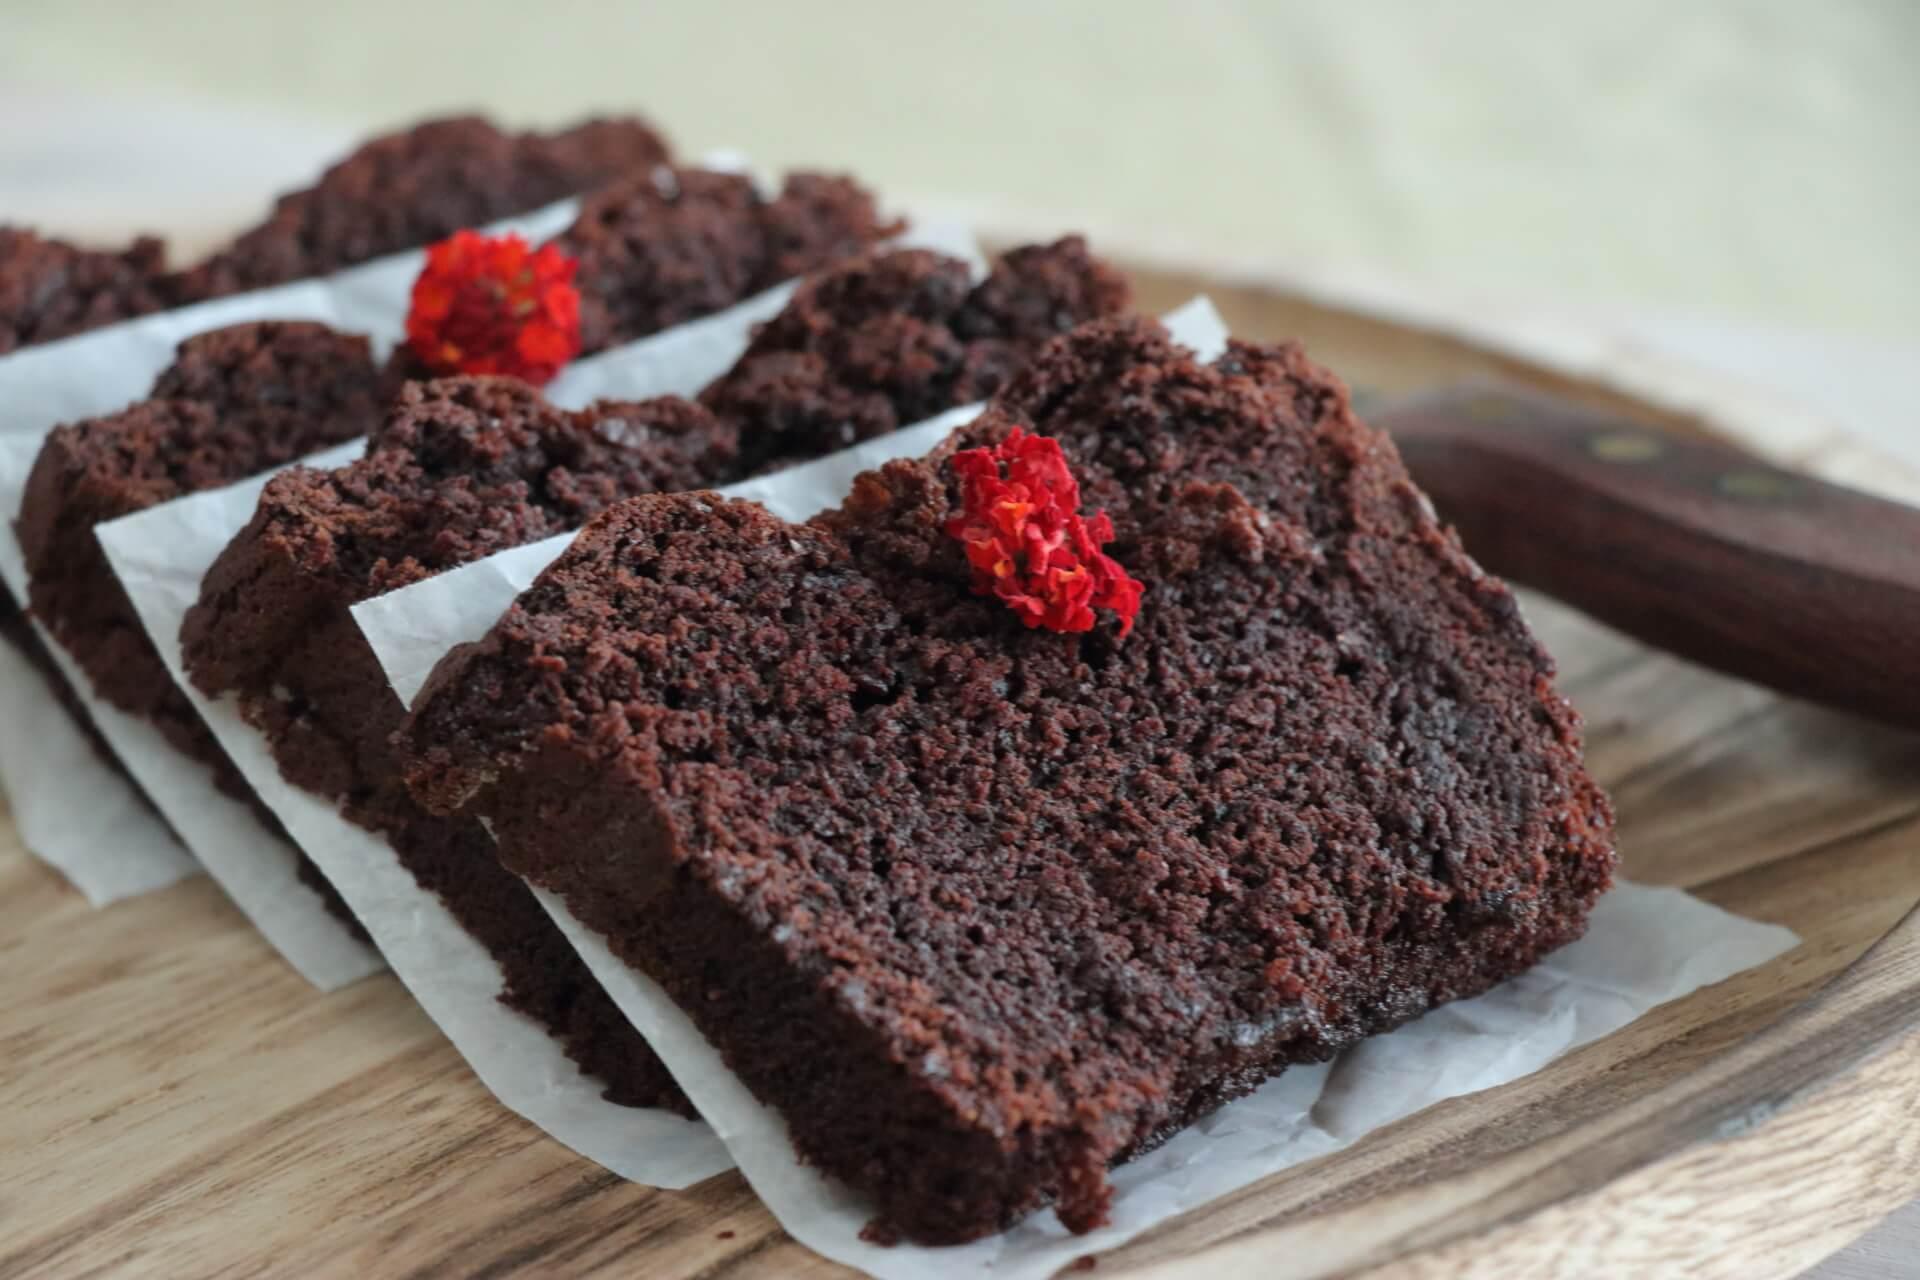 SQSP_Ε191-Νηστίσιμο-σοκολατένιο-κέικ-με-ταχίνι_IMG_0716_1.JPG